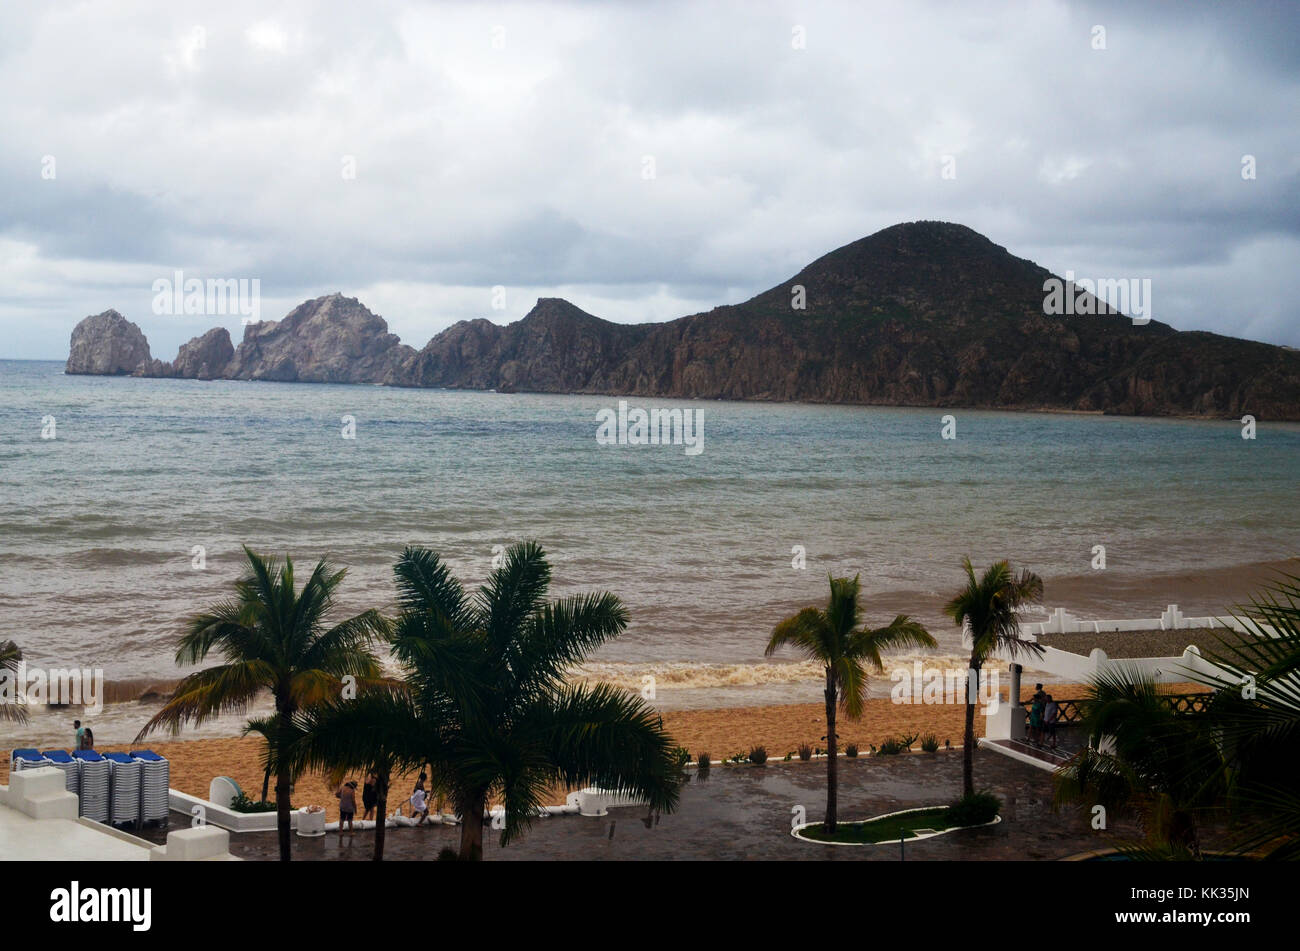 Dating Cabo San Lucas